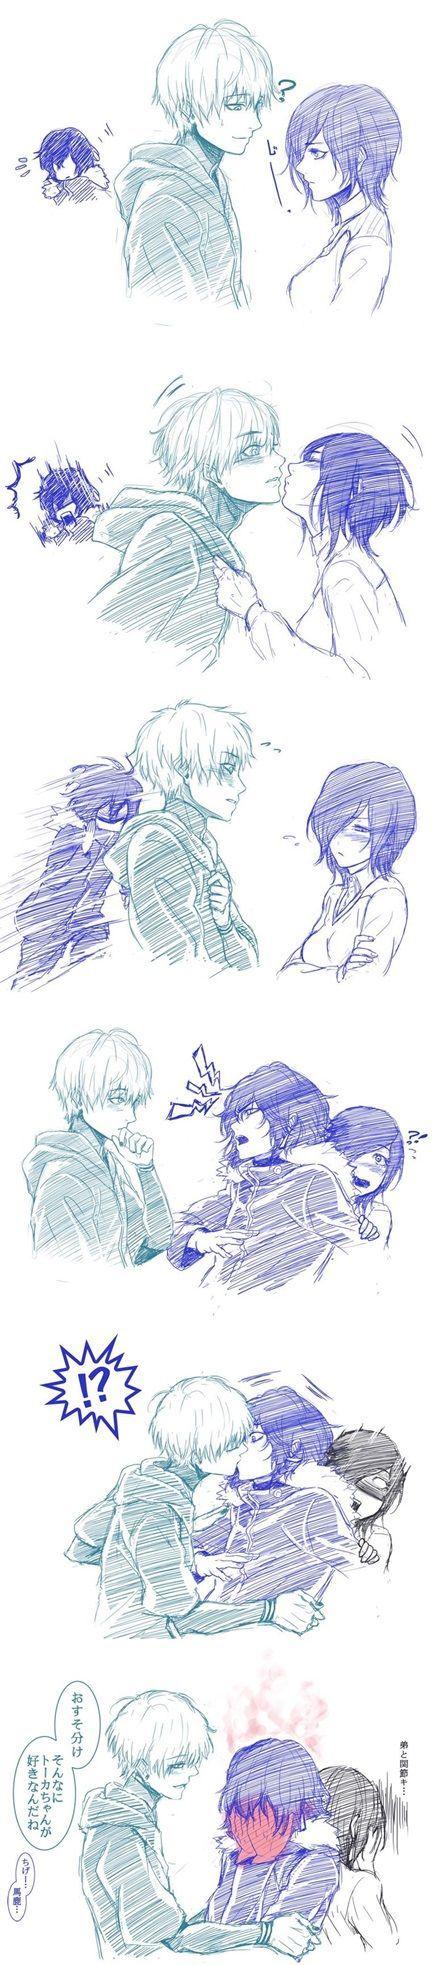 Tokyo Ghoul   Kaneki x Ayato (and Touka)   yaoi   kiss   cute *----*   Should I ship Kaneki with Ayato? xdd :3 AWE!!!// pins for 8 years